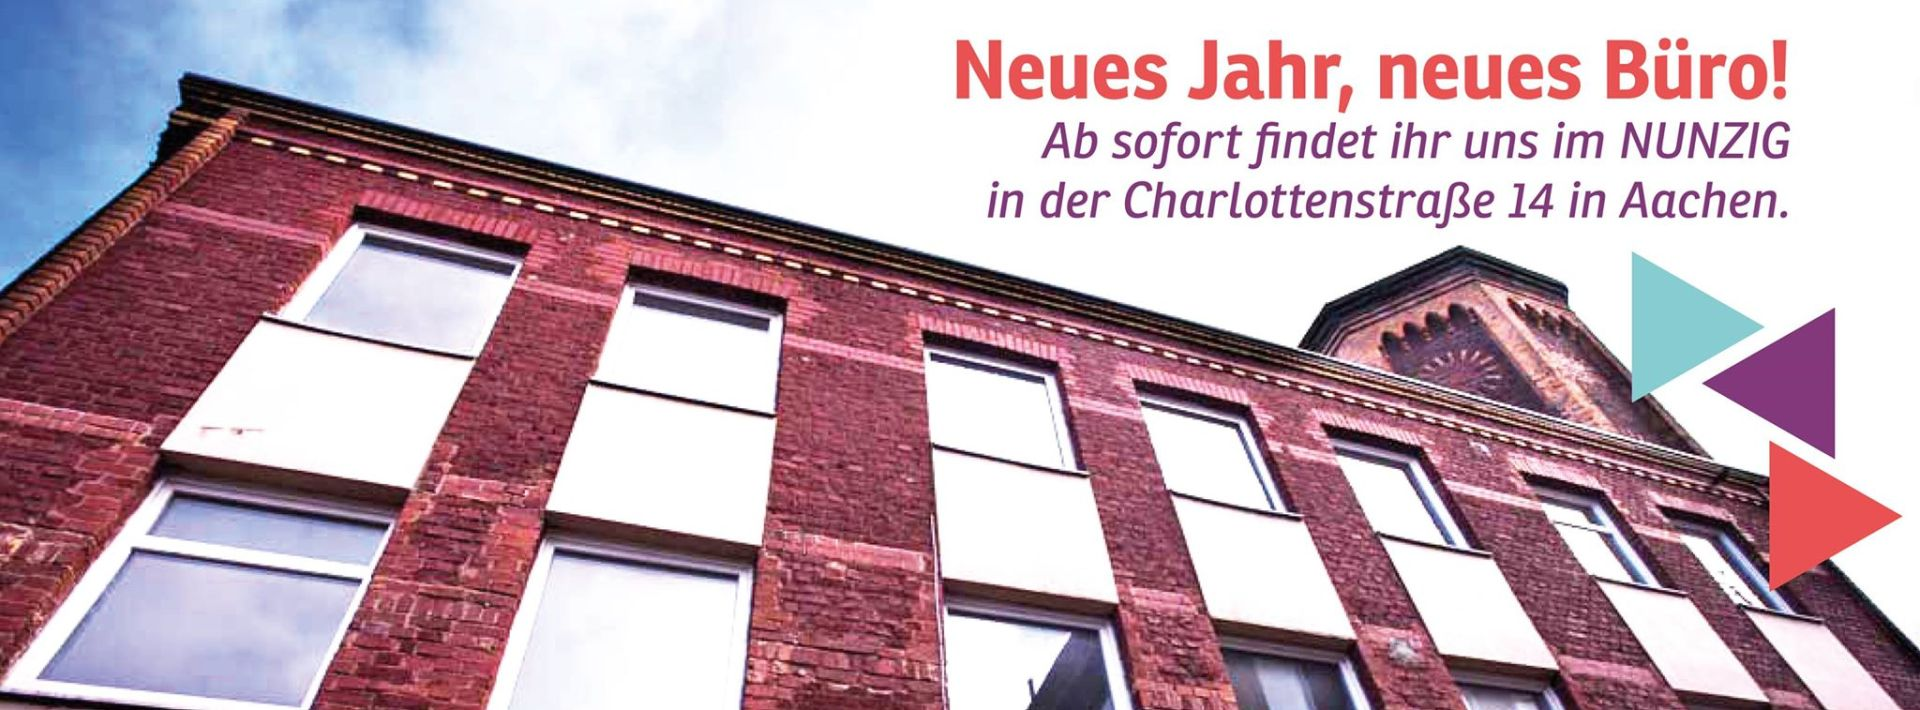 Coworking Nunzig, Aachen - Read Reviews & Book Online